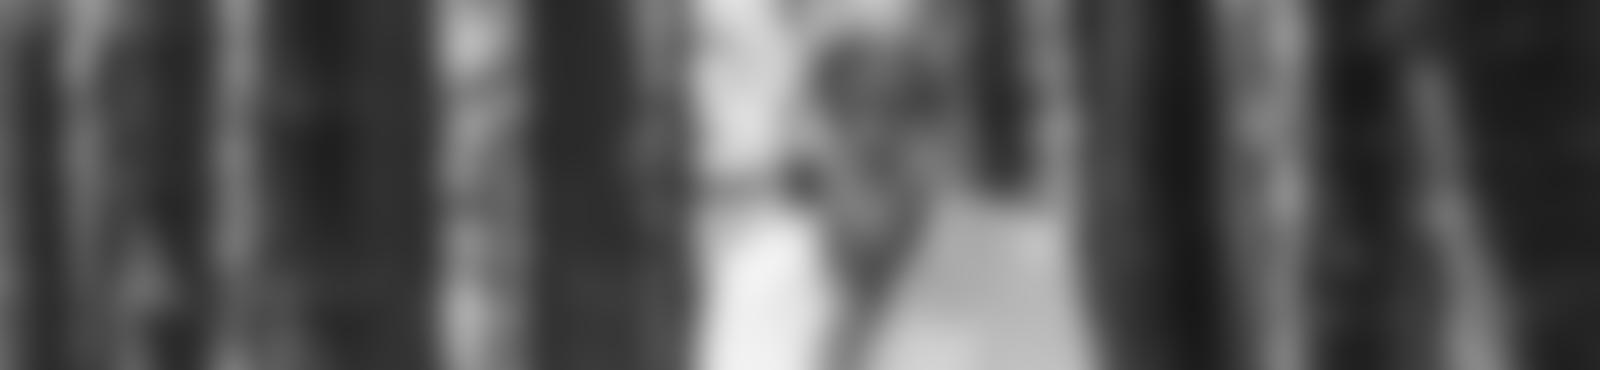 Blurred a8397c94 7860 48f8 bb28 5c27450e84de